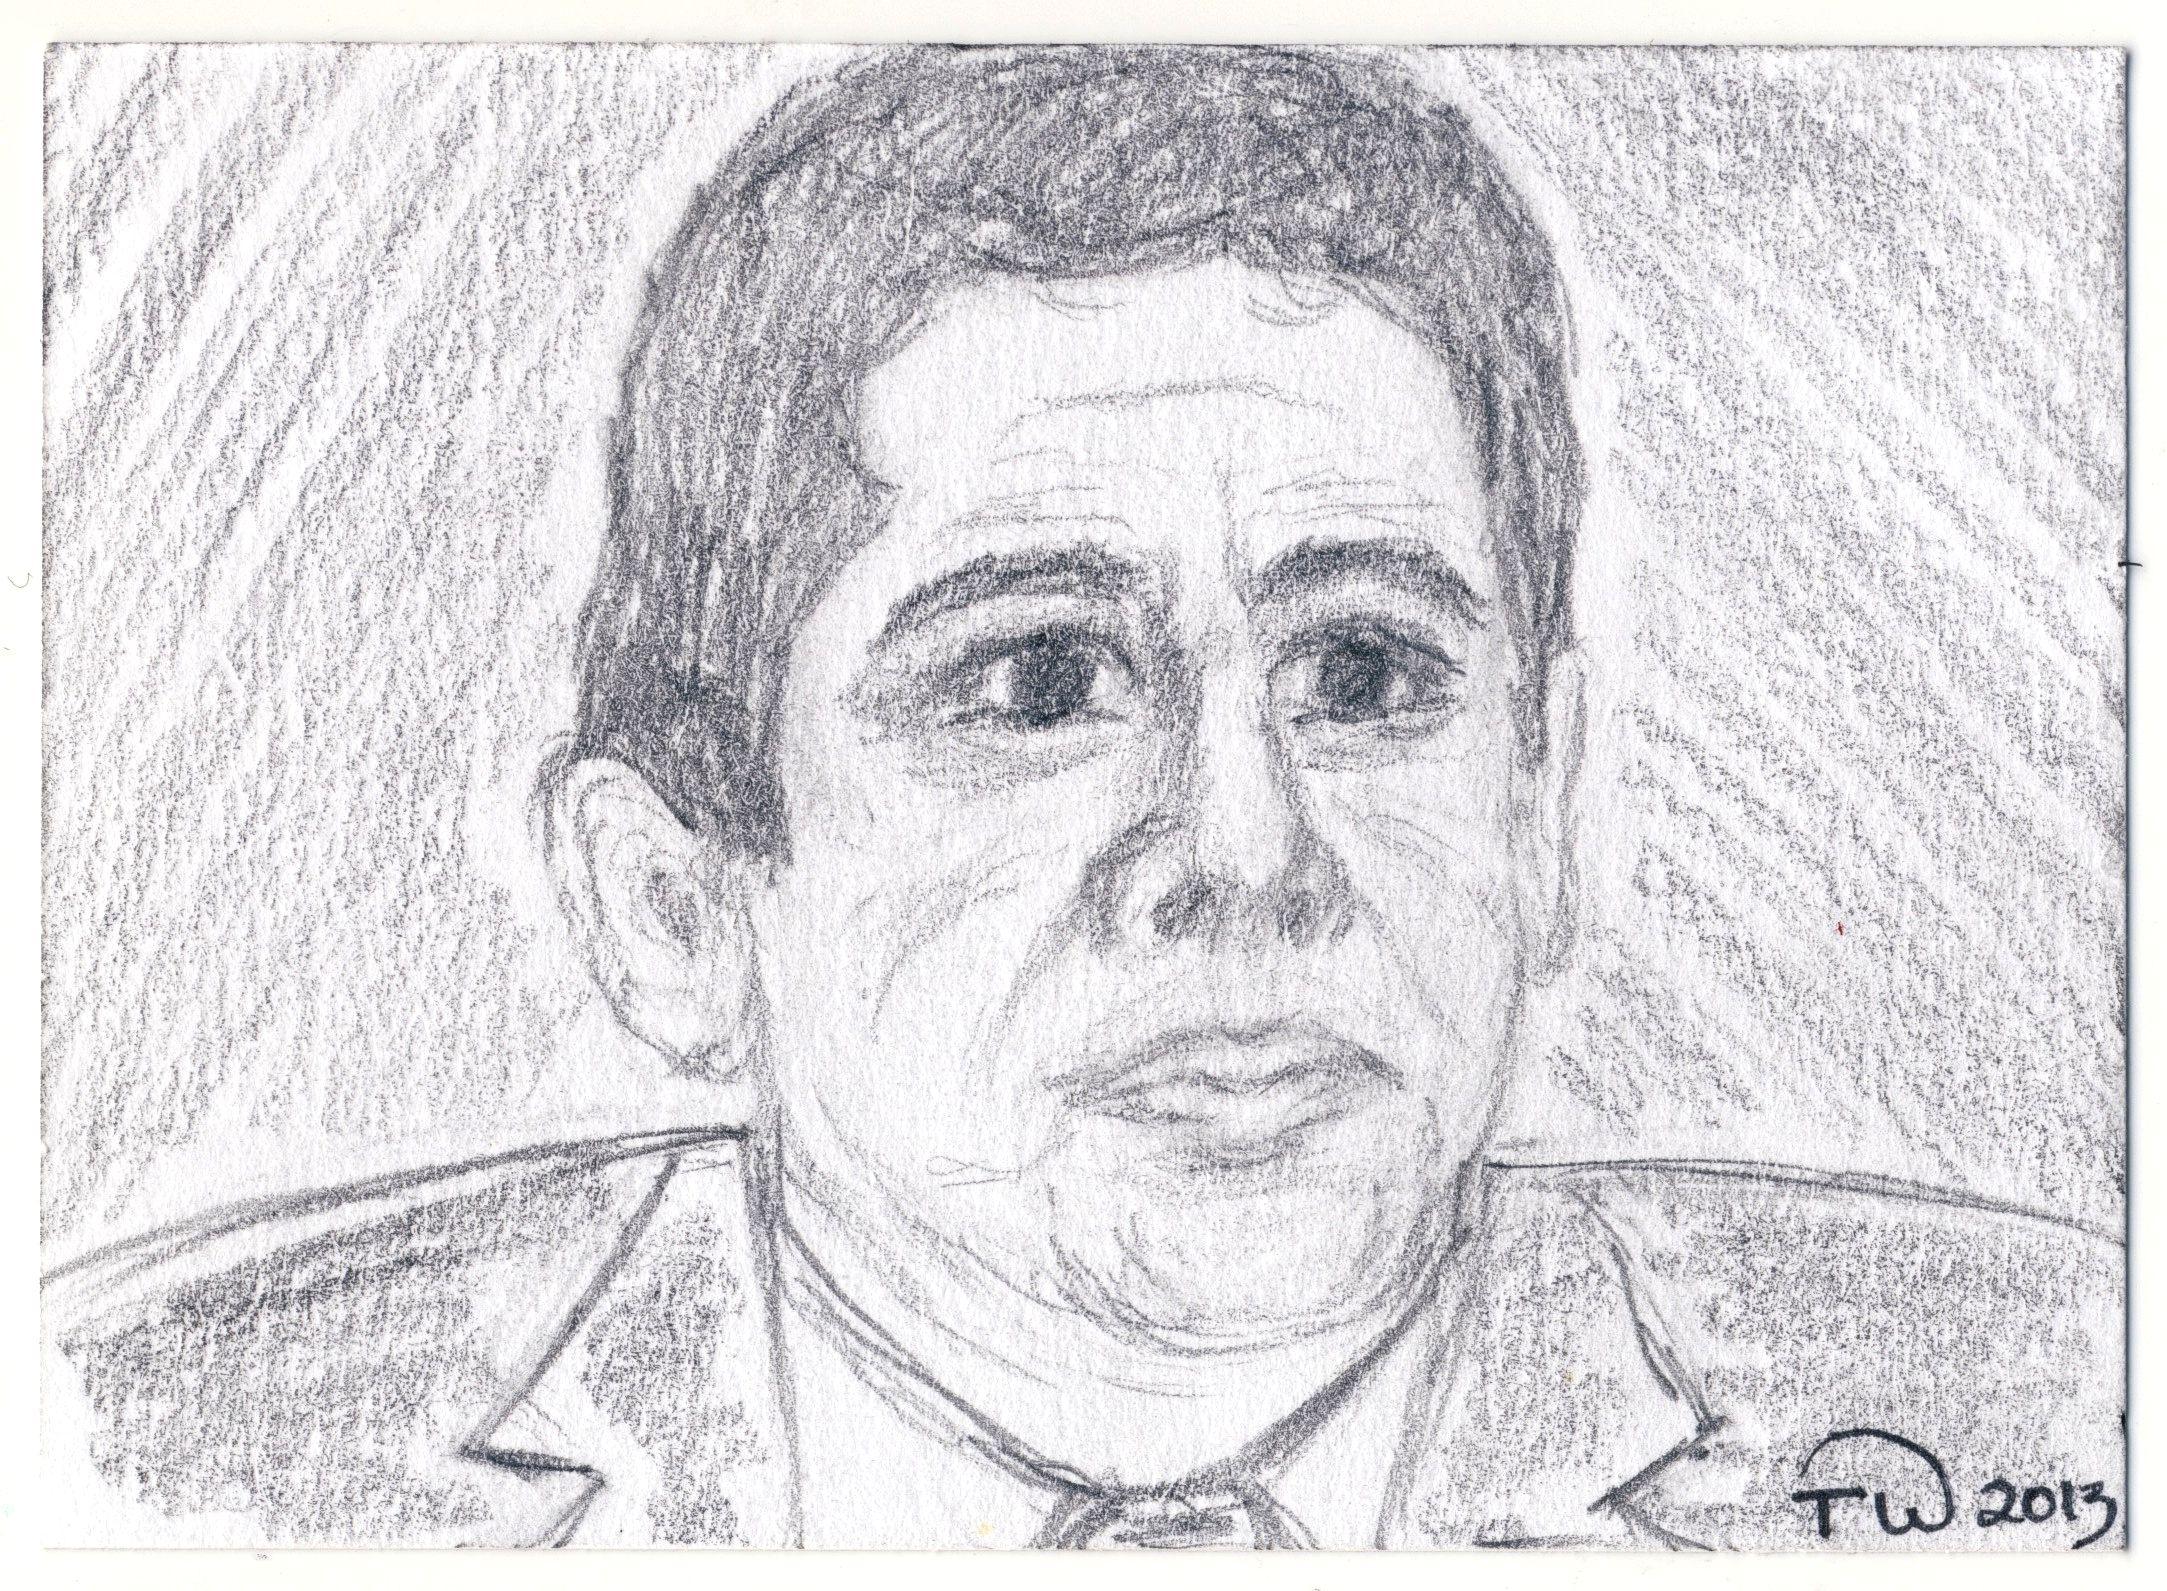 Juan martinez prosecuting attorney biography - Alyce Laviolette To Juan Martinez Juan Martinez Prosecutor In The Jodi Arias Trial Trial Art Available At Tambrastudios Com Pinterest